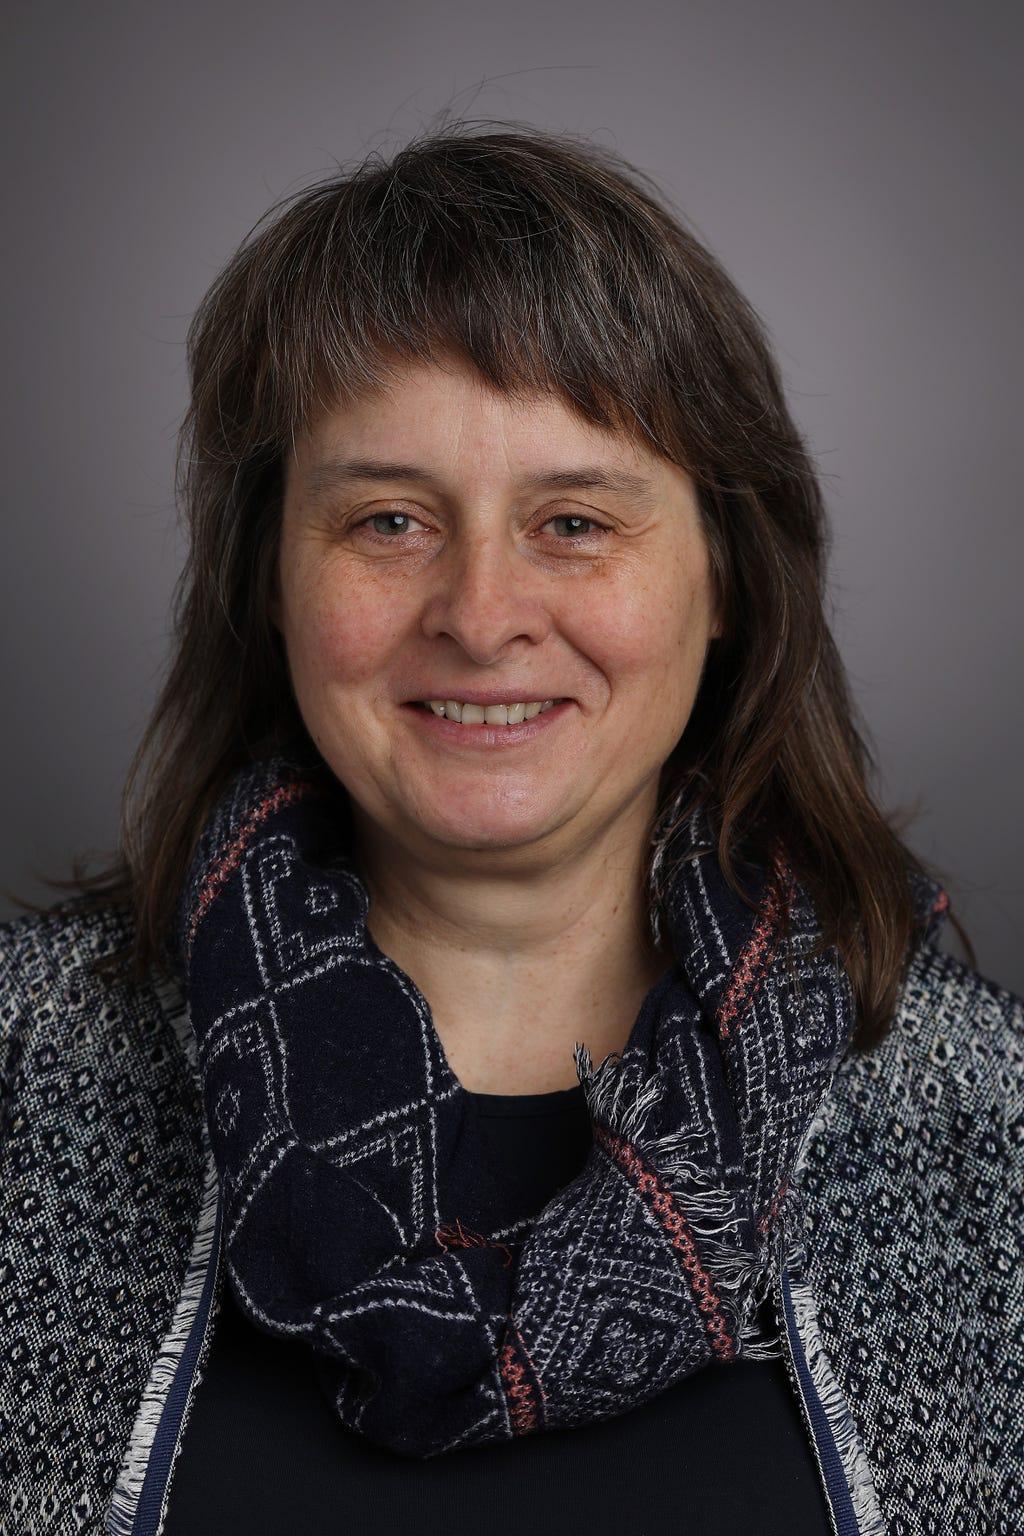 Bettina Klim